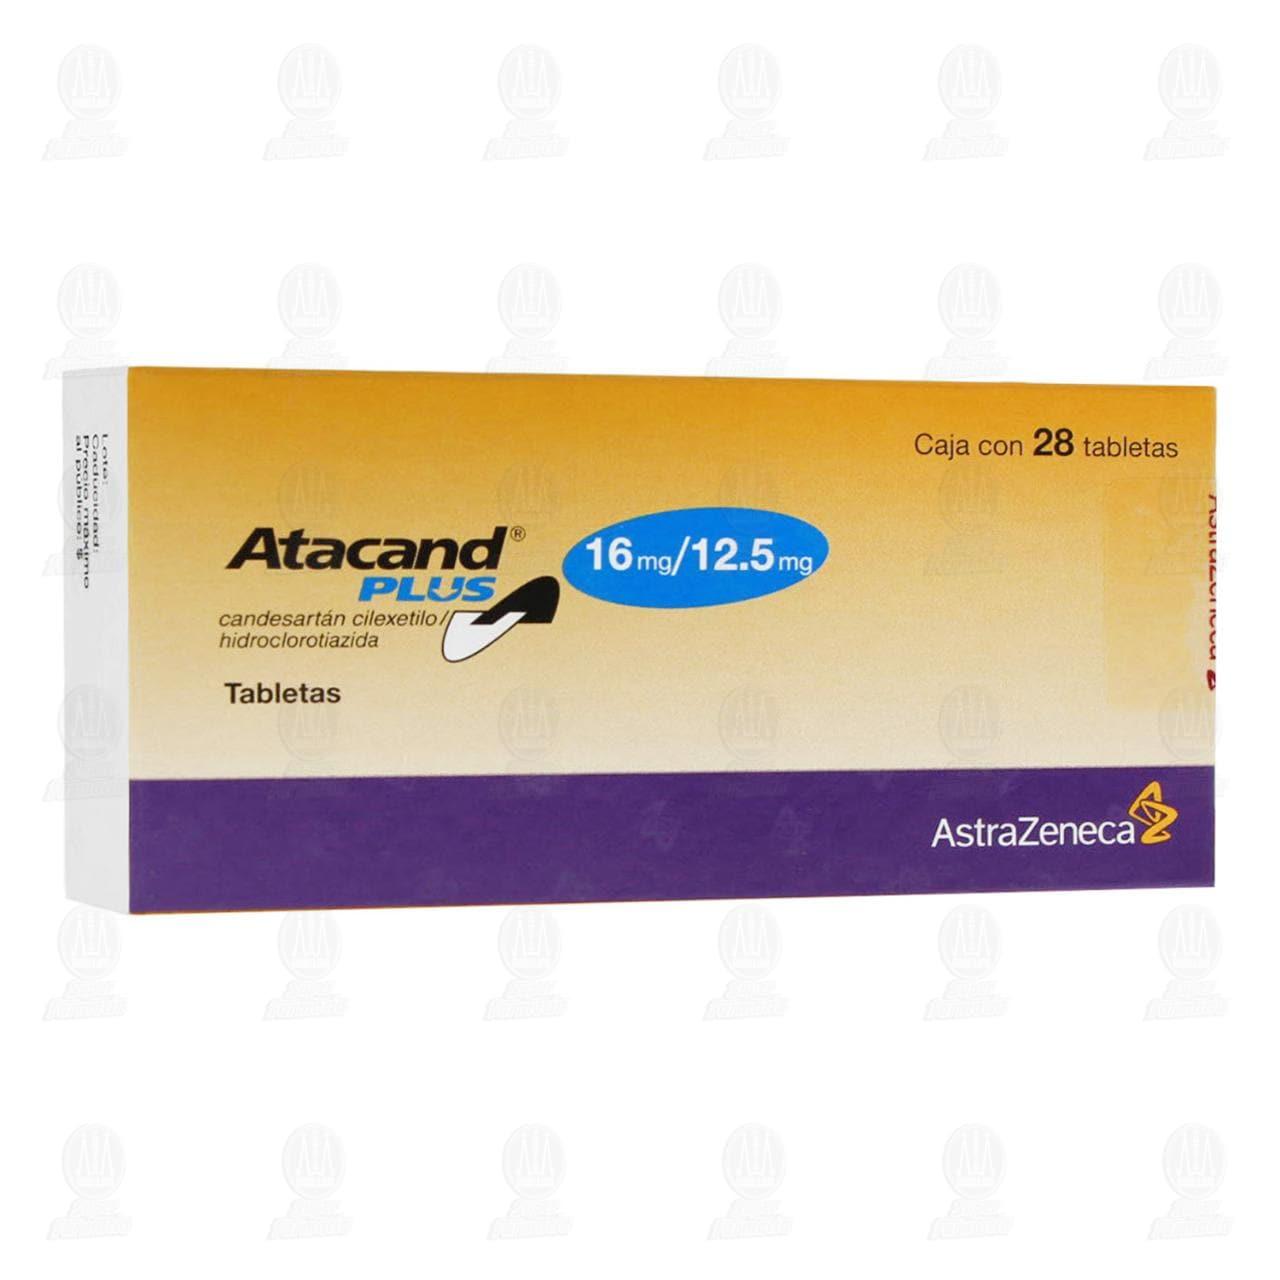 Comprar Atacand Plus 16mg/12.5mg 28 Tabletas en Farmacias Guadalajara